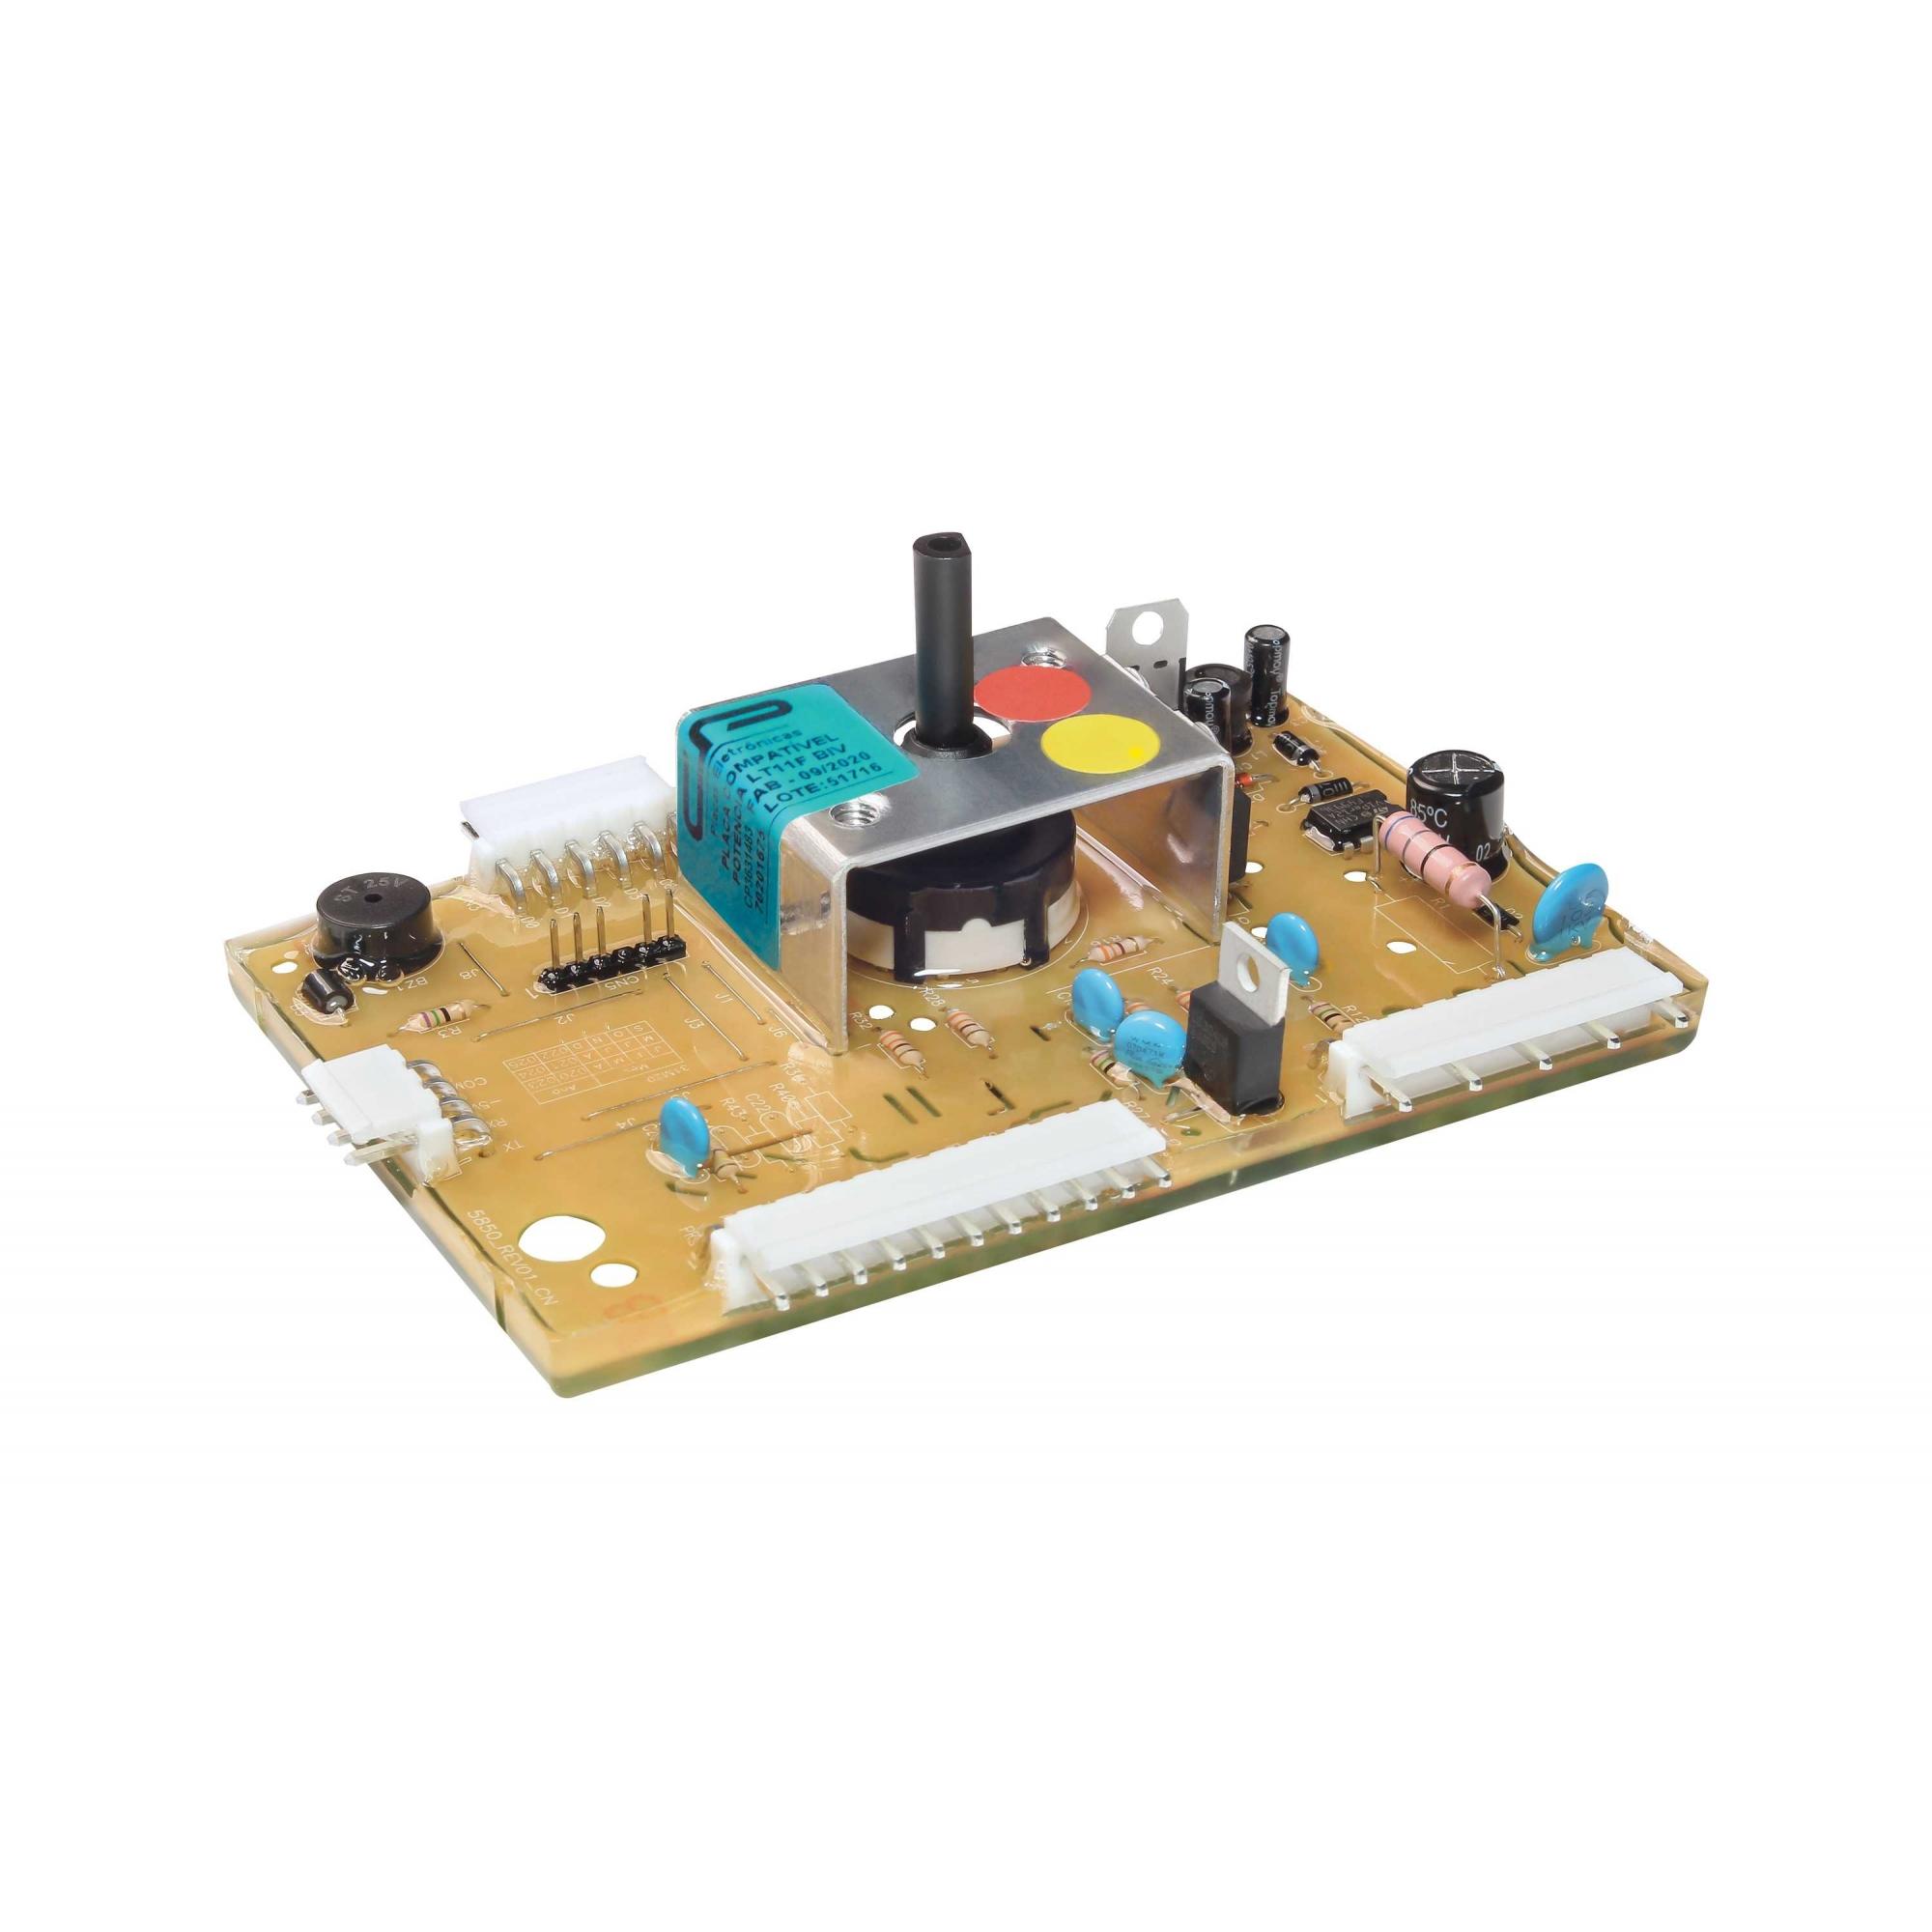 Placa eletrônicacompatível lavadora Electrolux LT11F